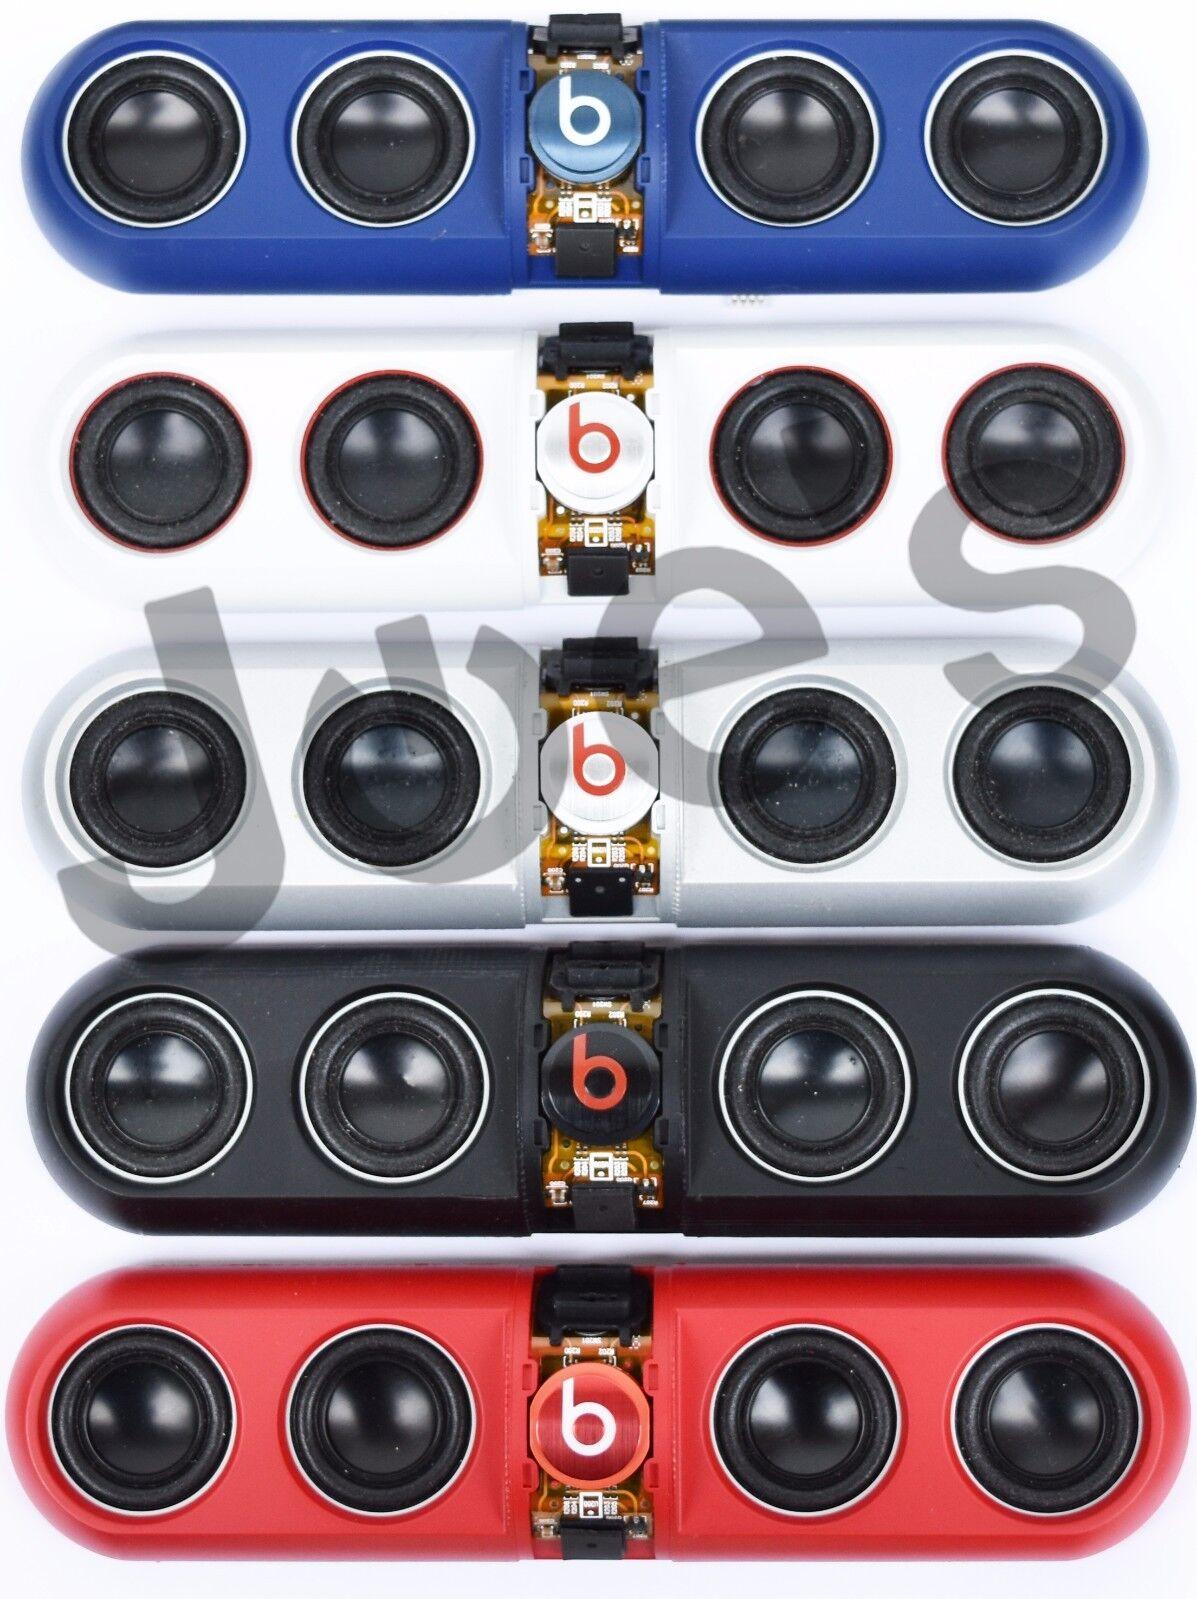 $29.99 - Beats By Dre Pill 2 2.0 Speaker Portable Bluetooth Part Parts Speaker Frame